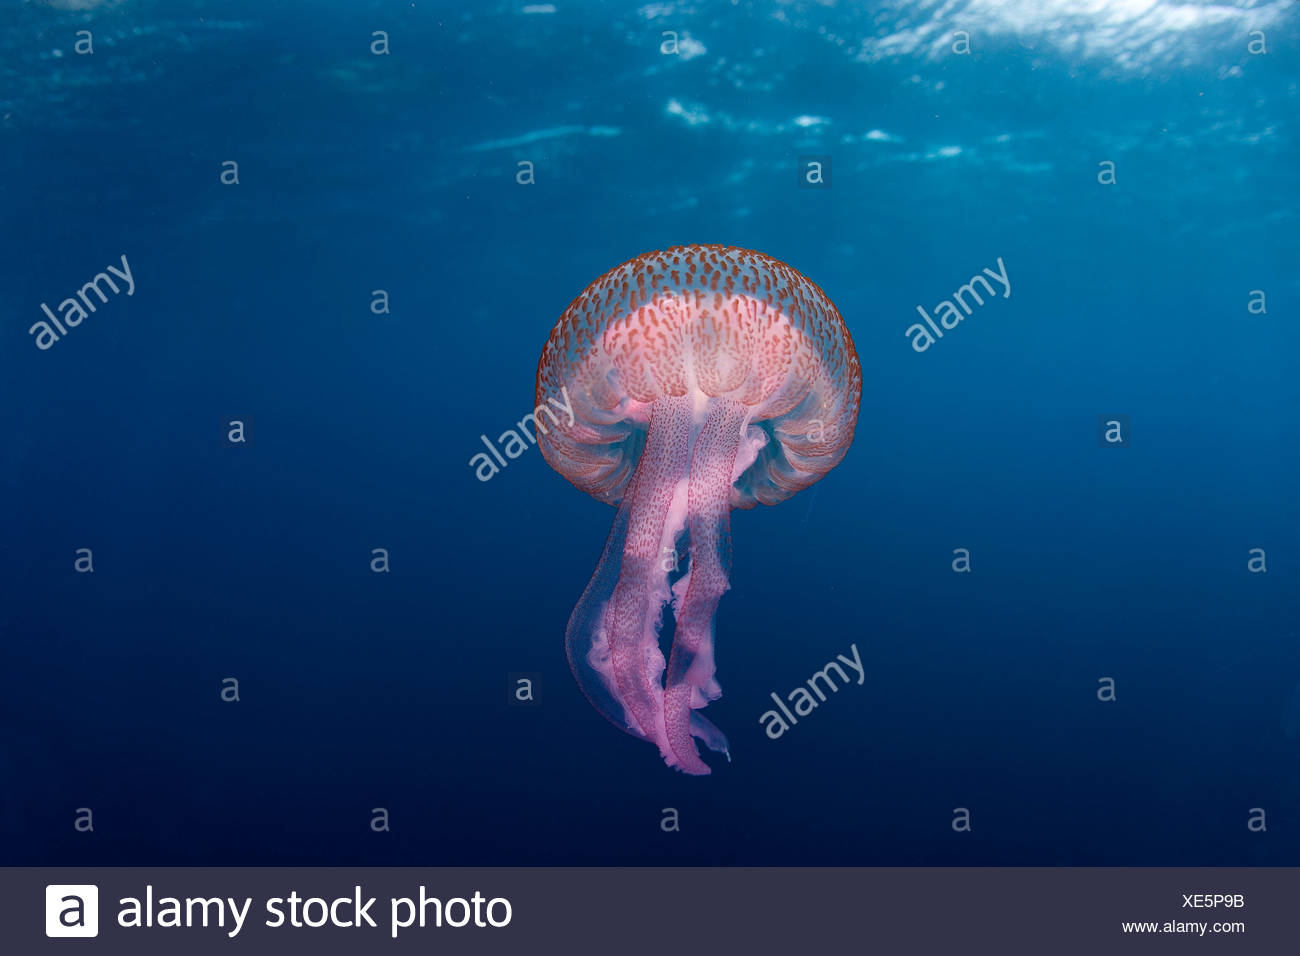 Mauve stinger jellyfish close to the surface, Marettimo Island, Egadi group, NW coast Sicily, Mediterranean Sea, Italy - Stock Image